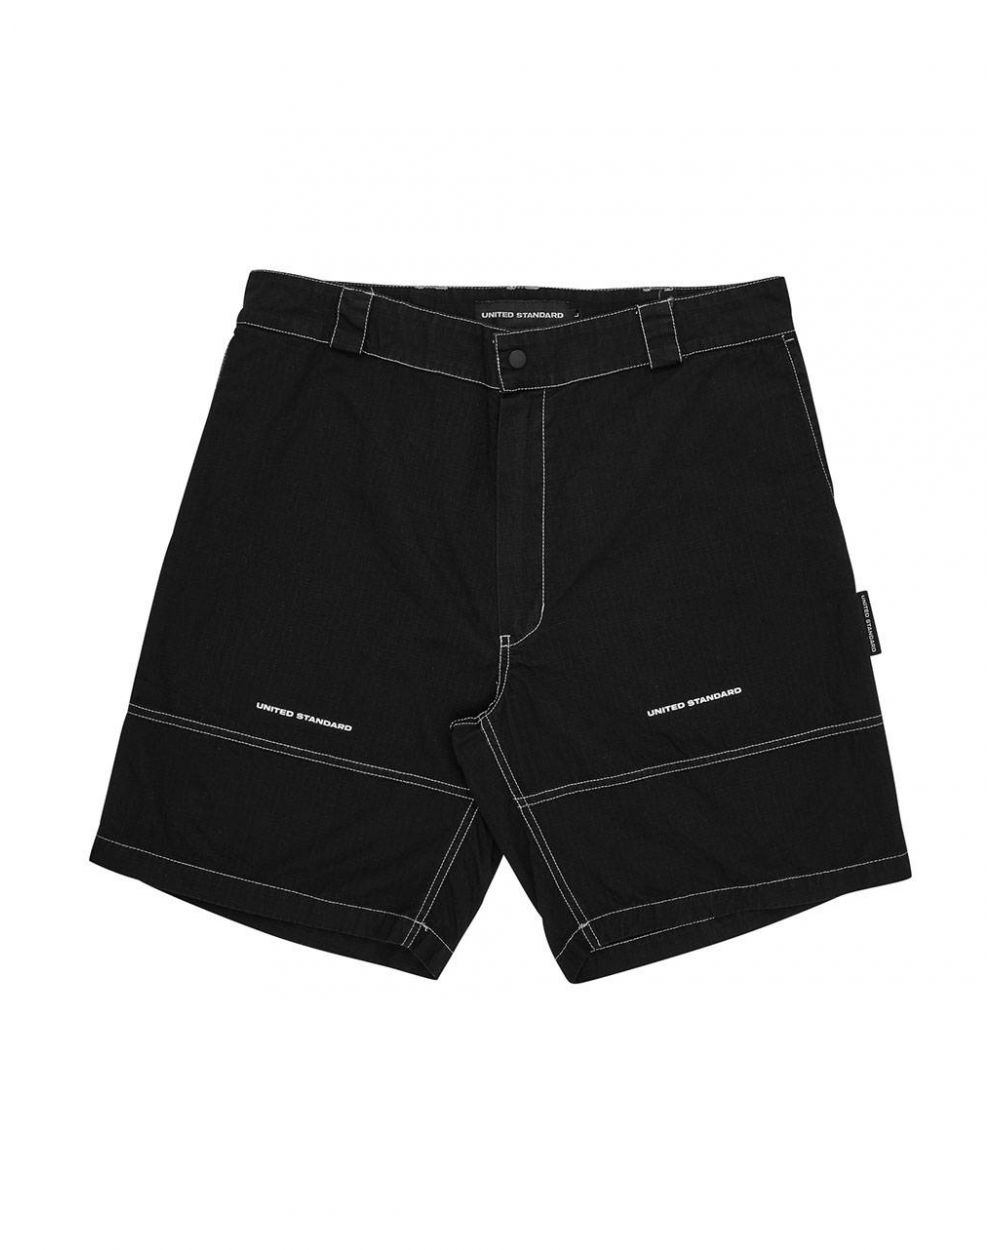 United Standard Mask shorts - black United Standard Shorts 189,00€